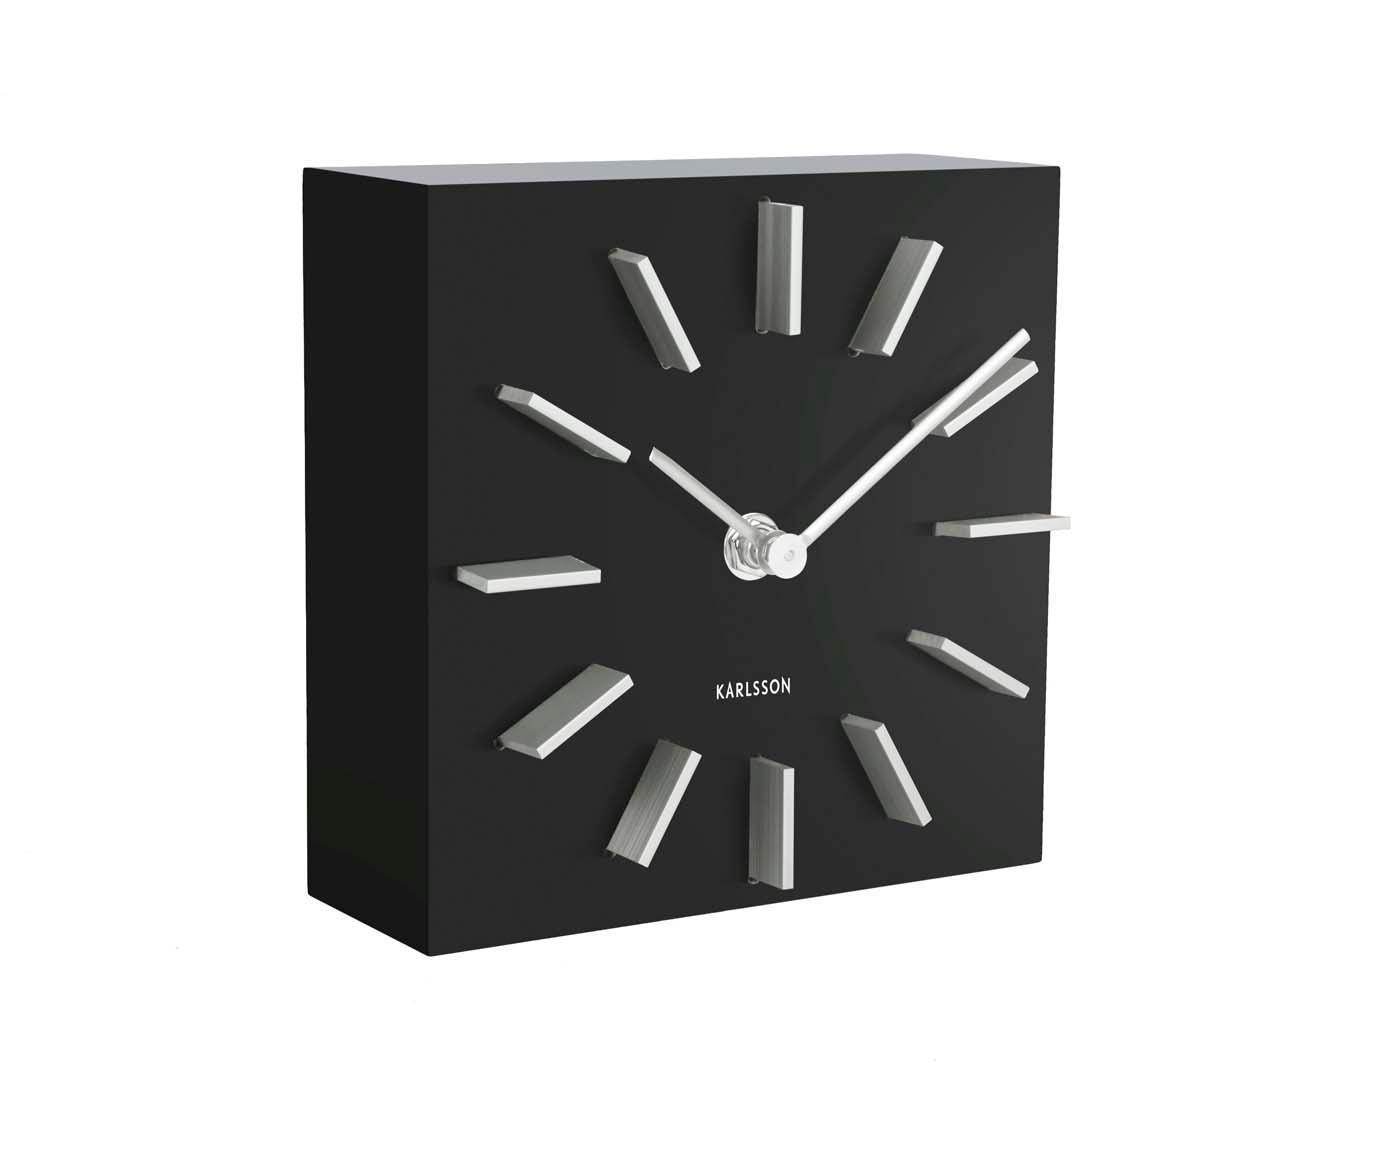 Tafelklok Discreet, MDF, Zwart, wit, 15 x 15 cm